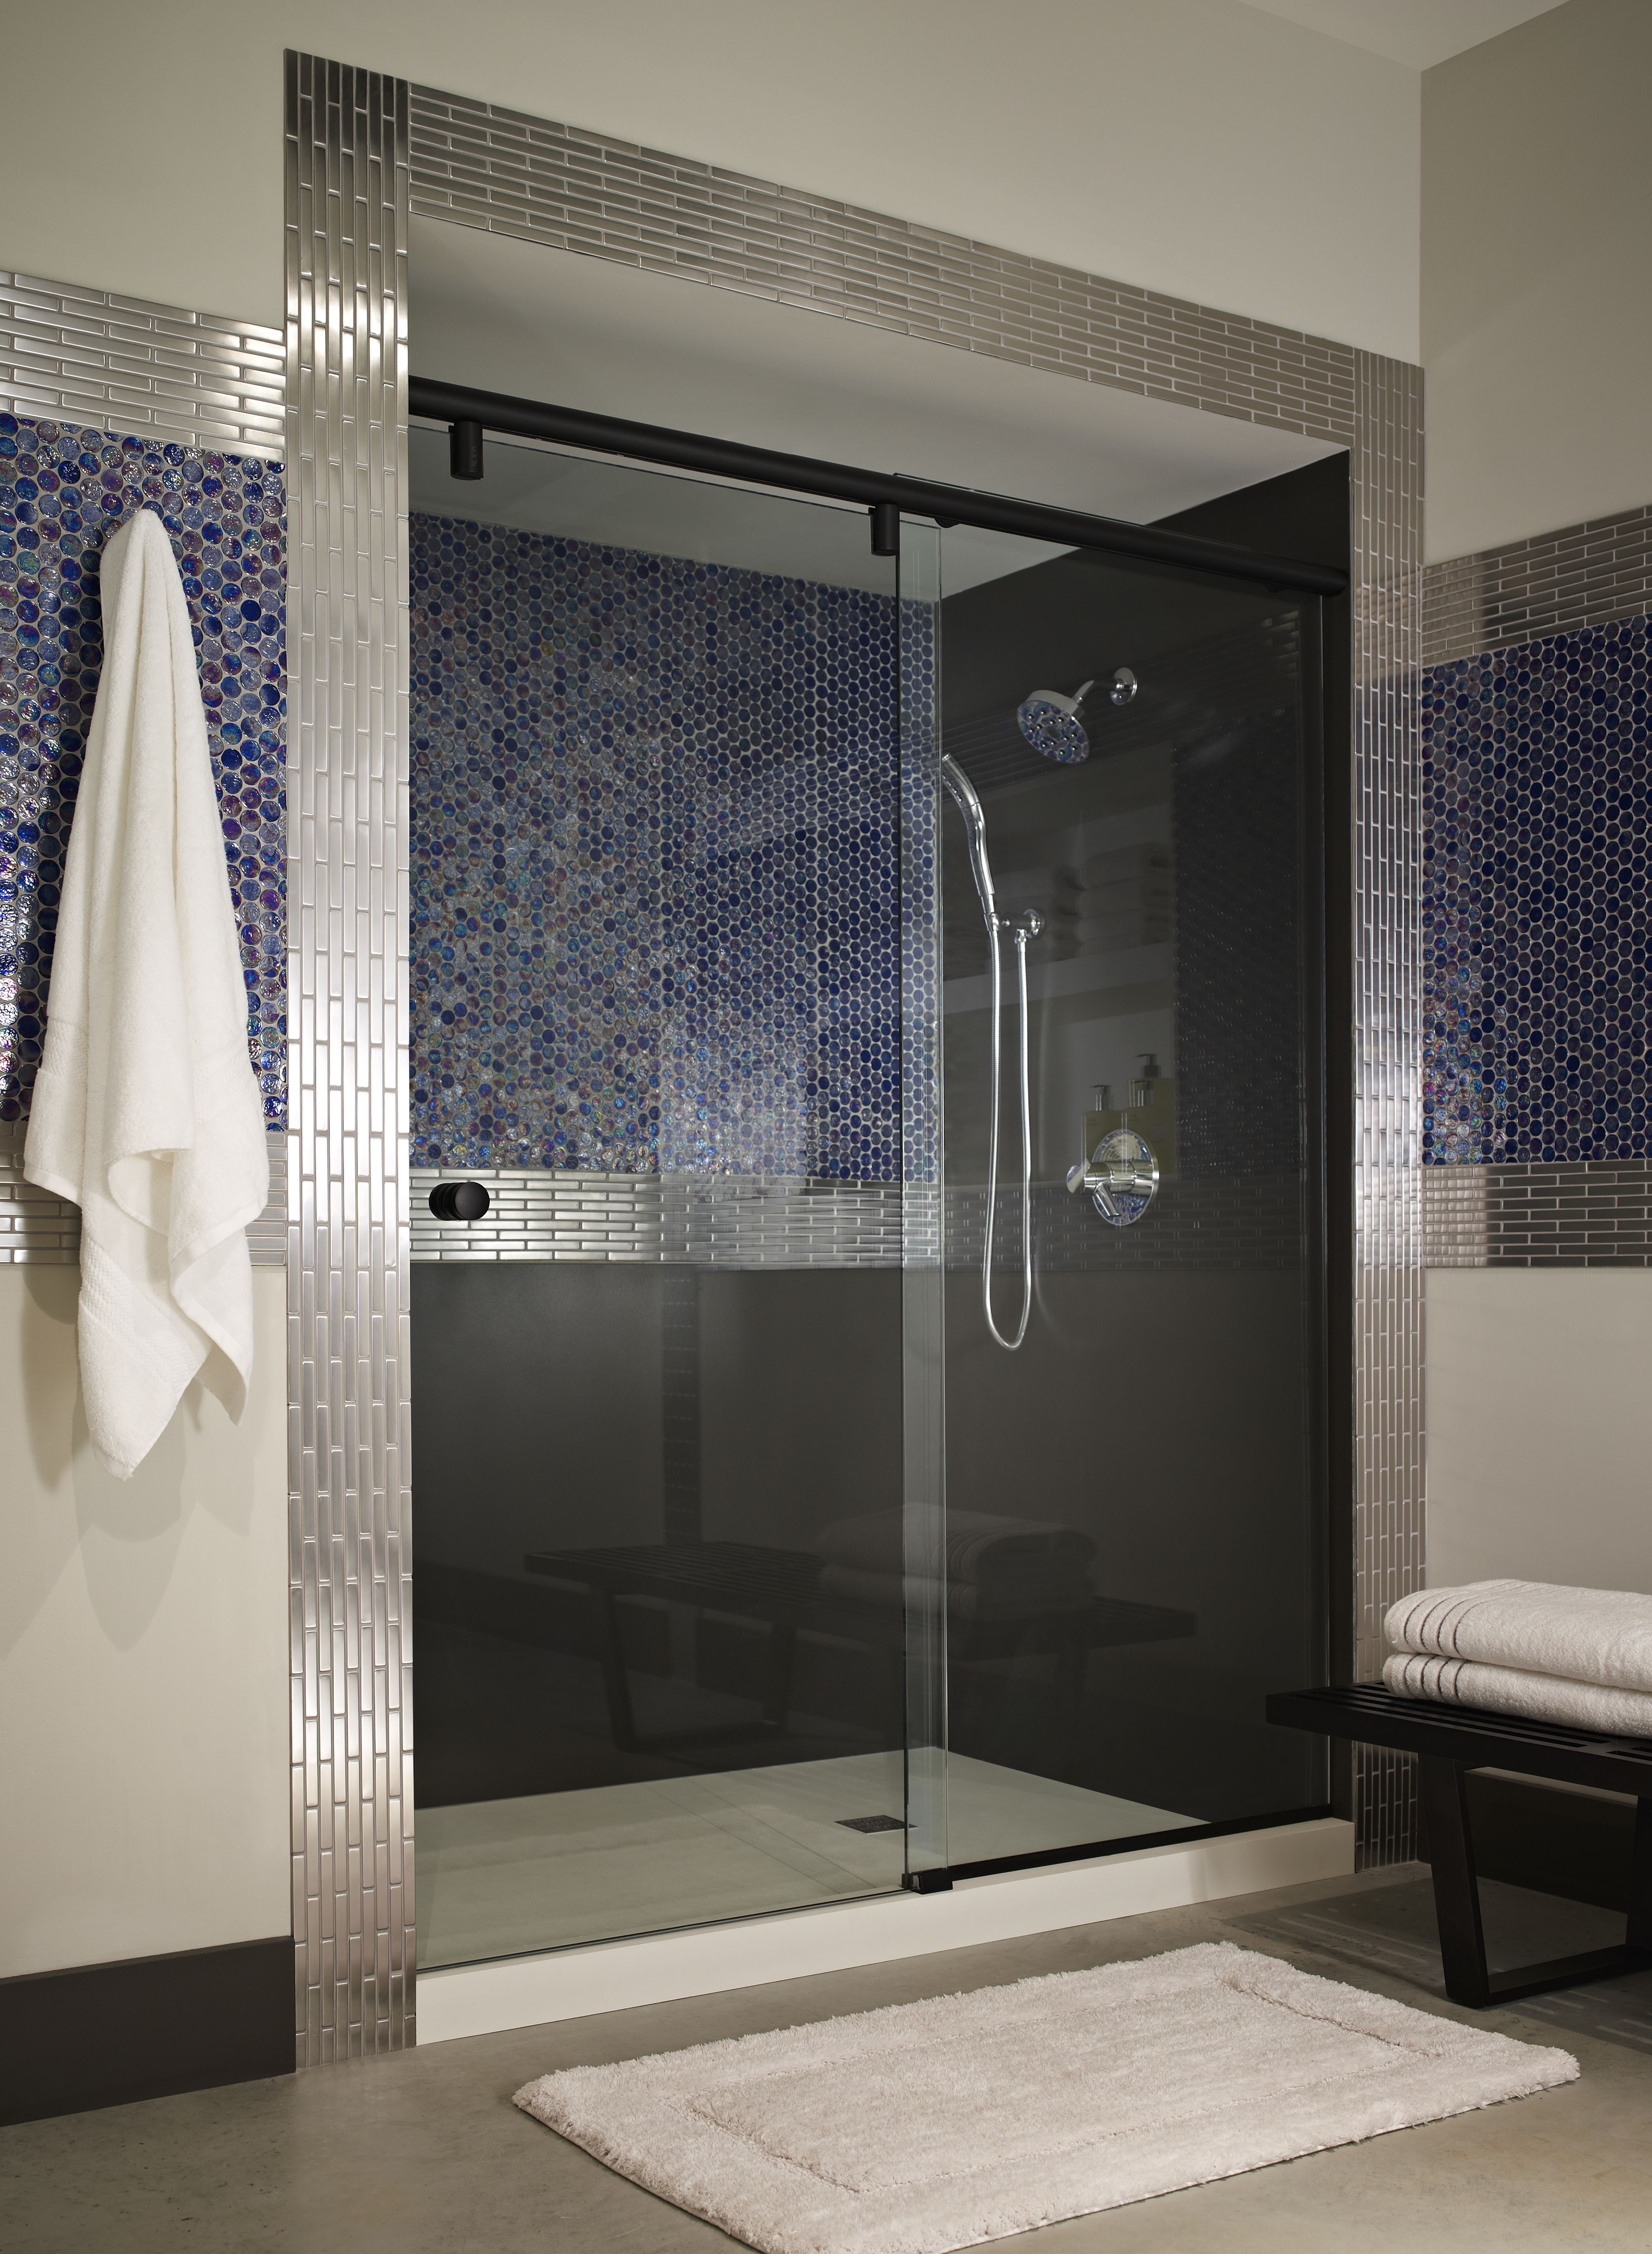 Evo Frameless 3 8 Inch Glass Rolling Door Shower Doors Glass